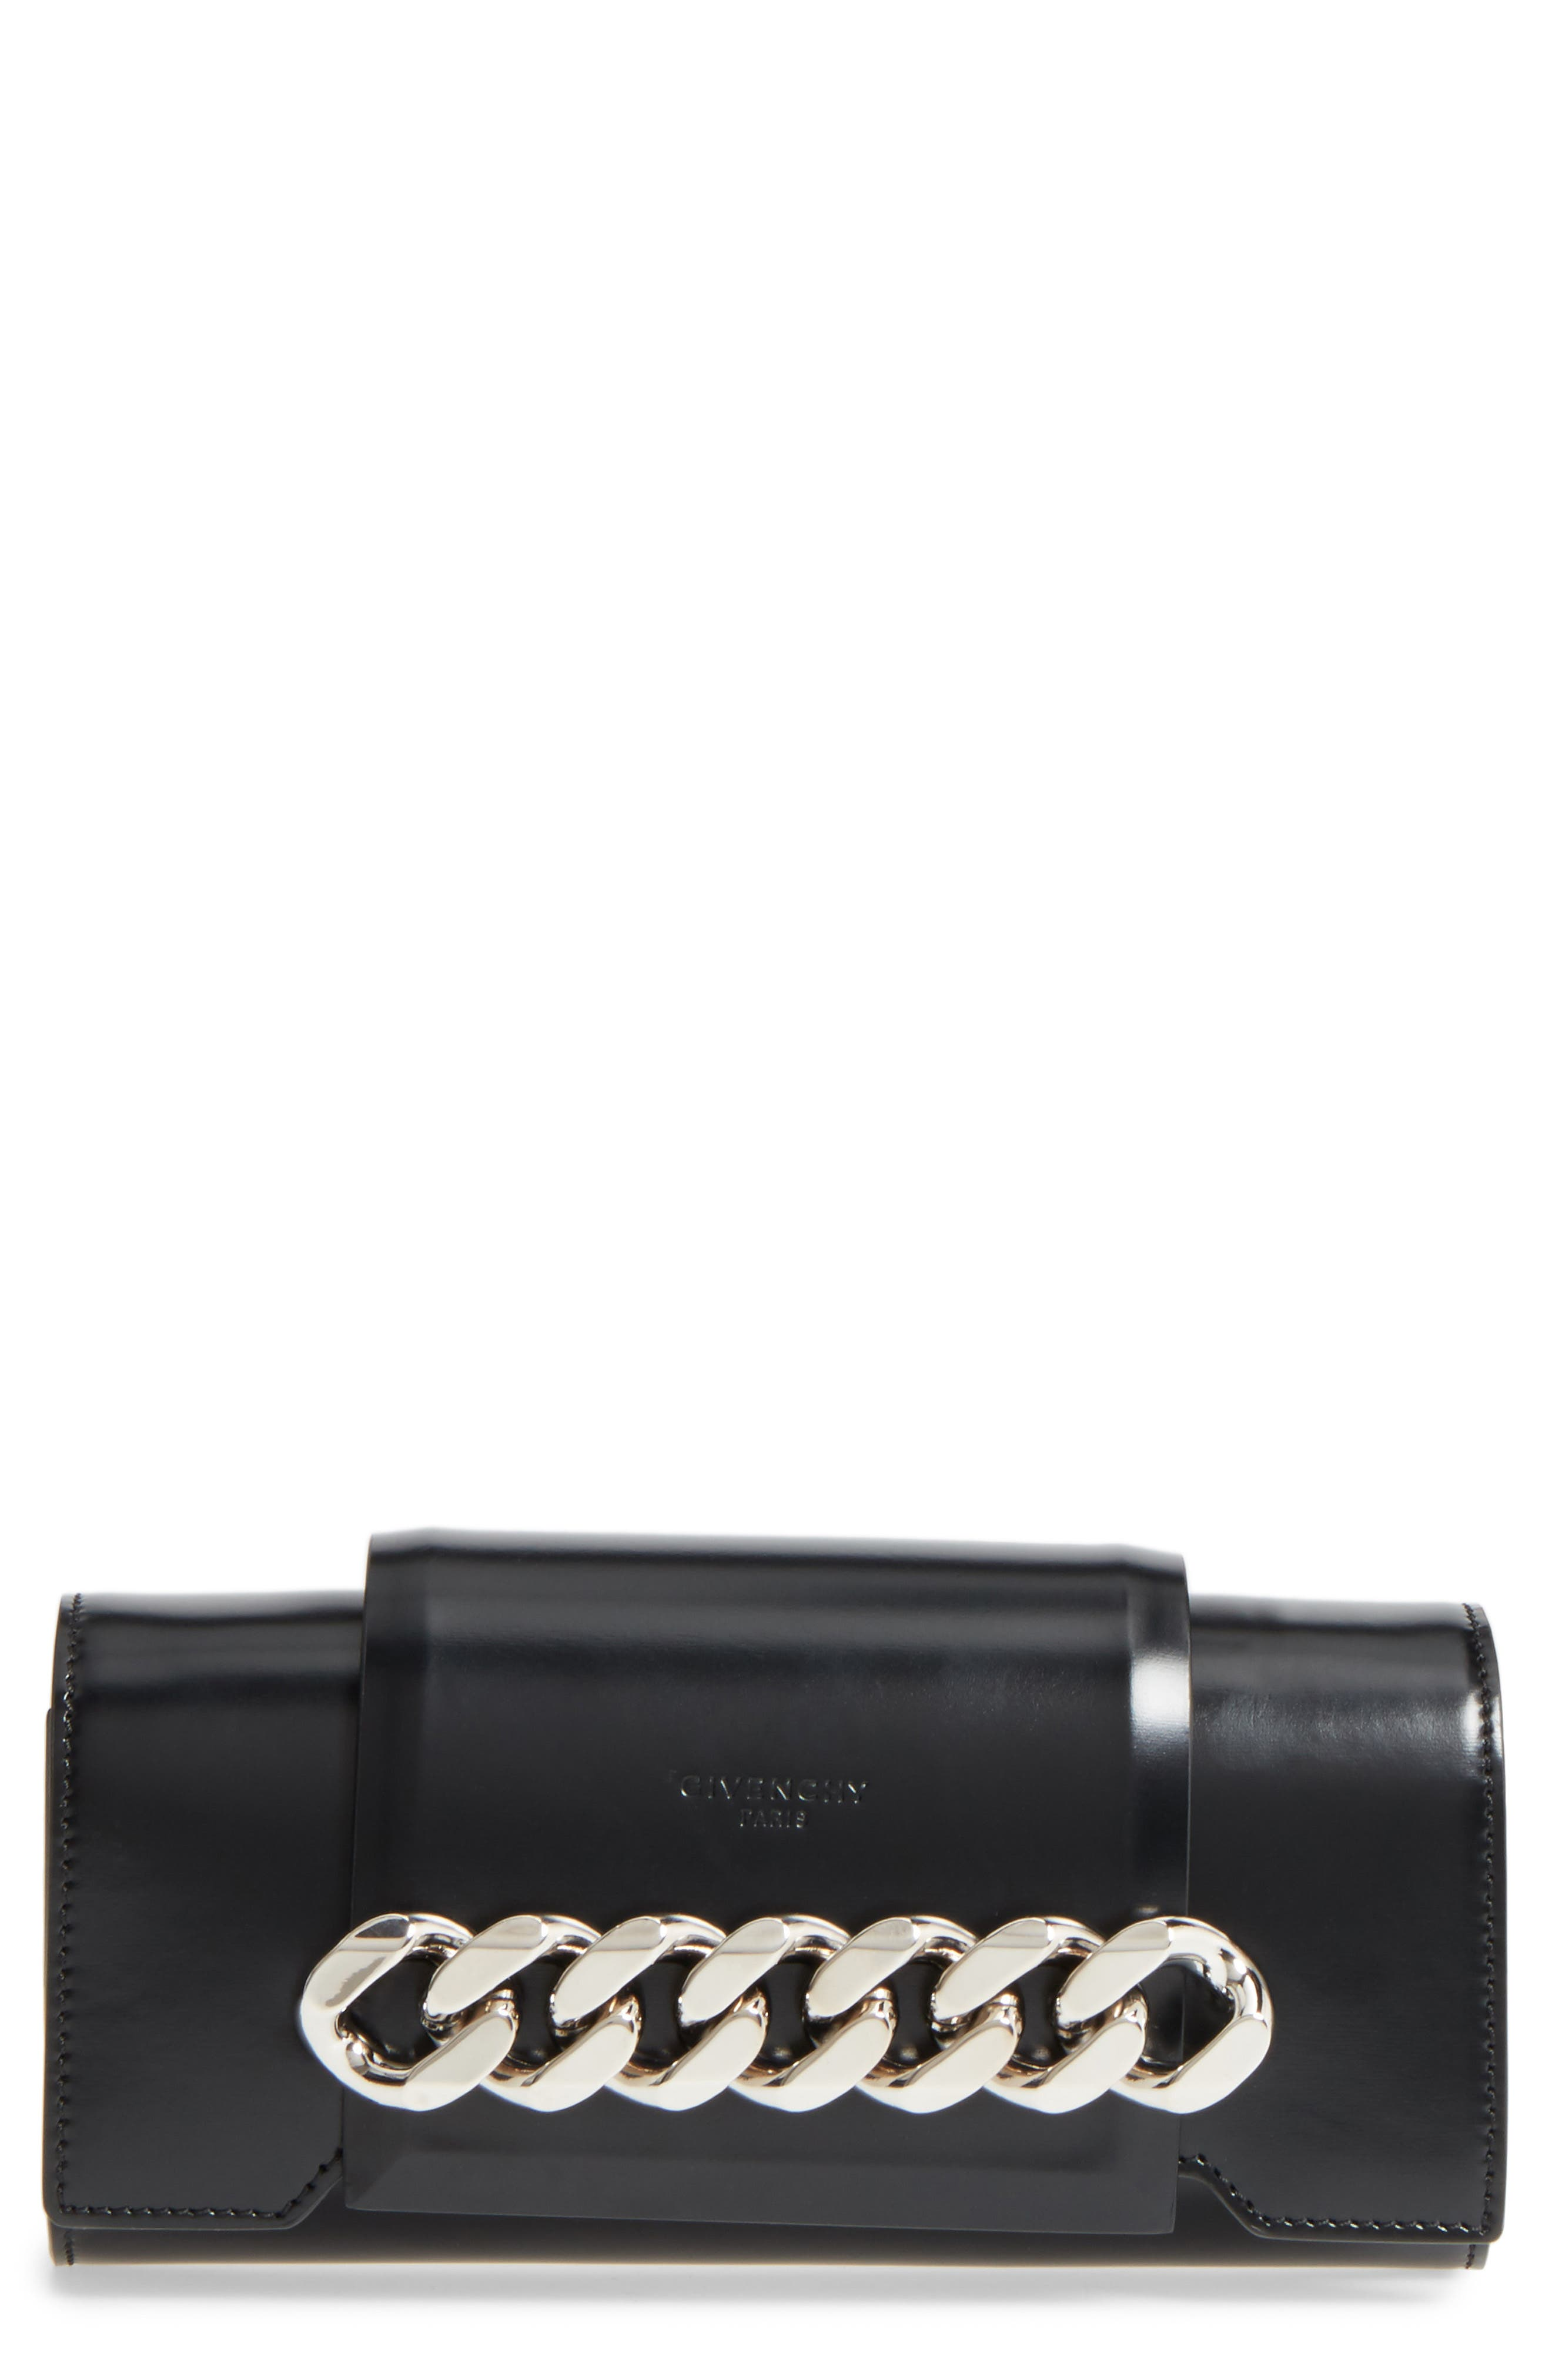 Mini Infinity Calfskin Leather Shoulder/Crossbody Bag,                             Main thumbnail 1, color,